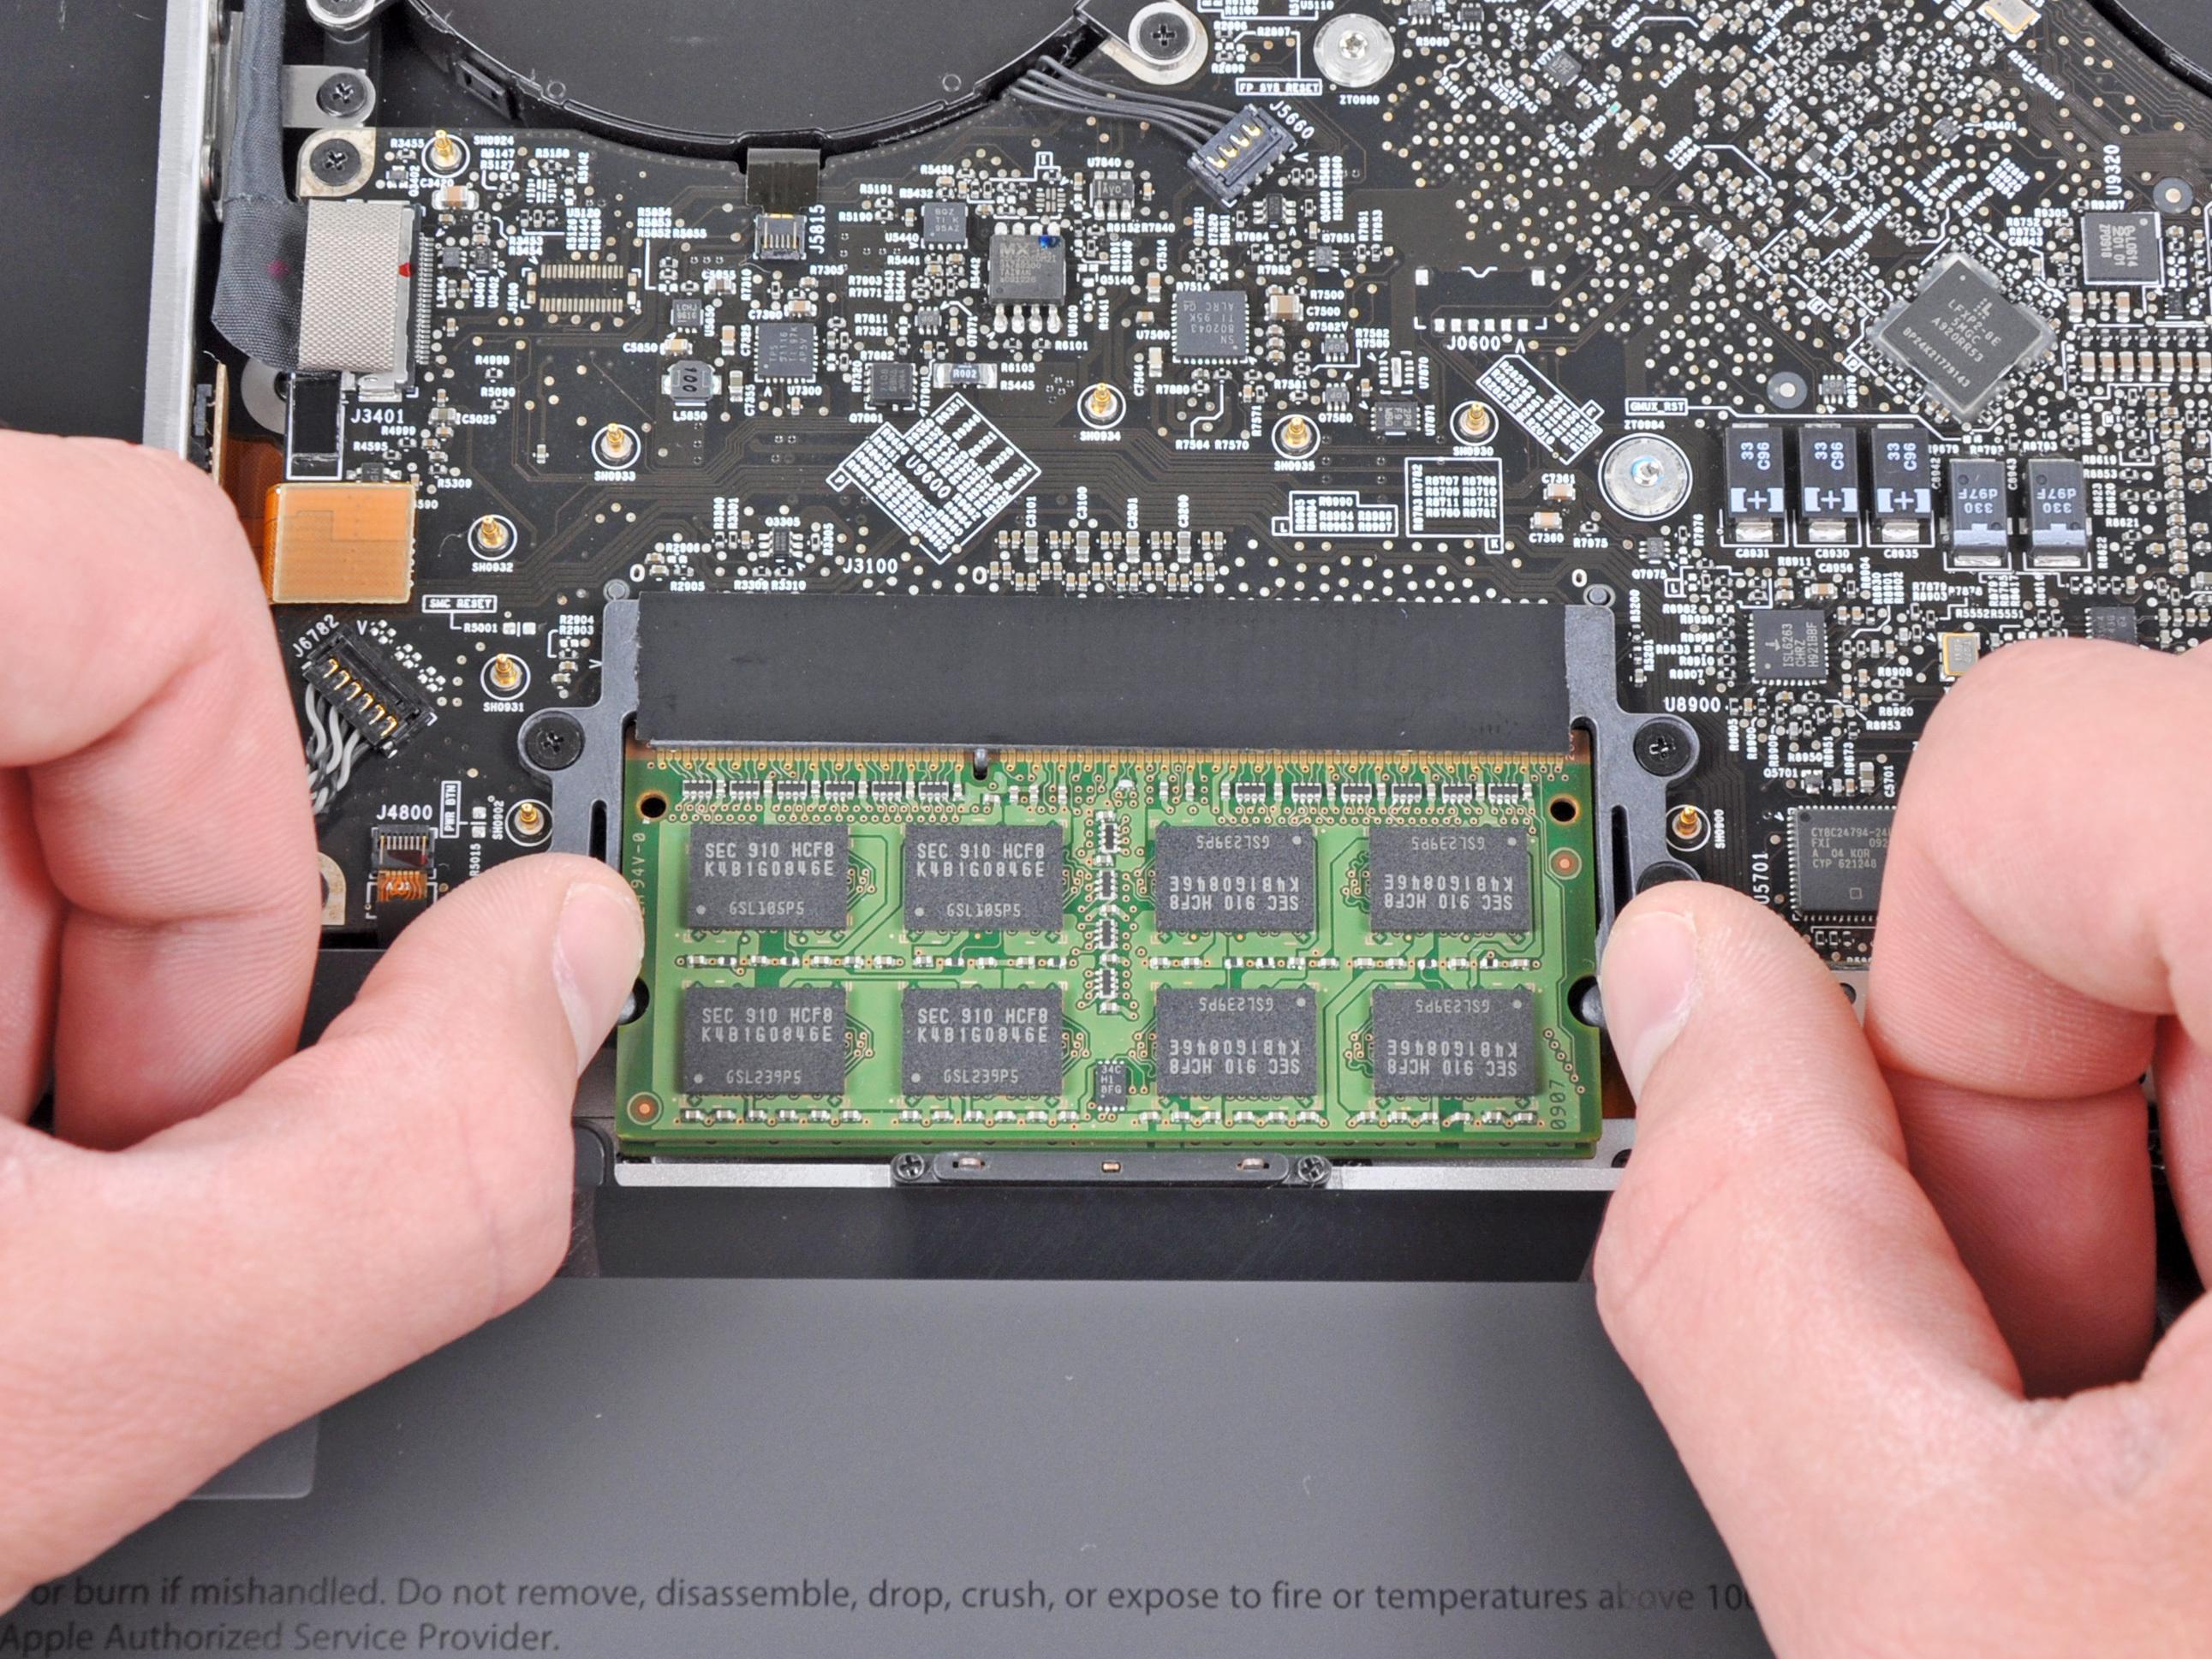 macbook pro 17 unibody ram replacement ifixit repair guide rh ifixit com MacBook Pro Unibody Replacement MacBook Pro Unibody Replacement